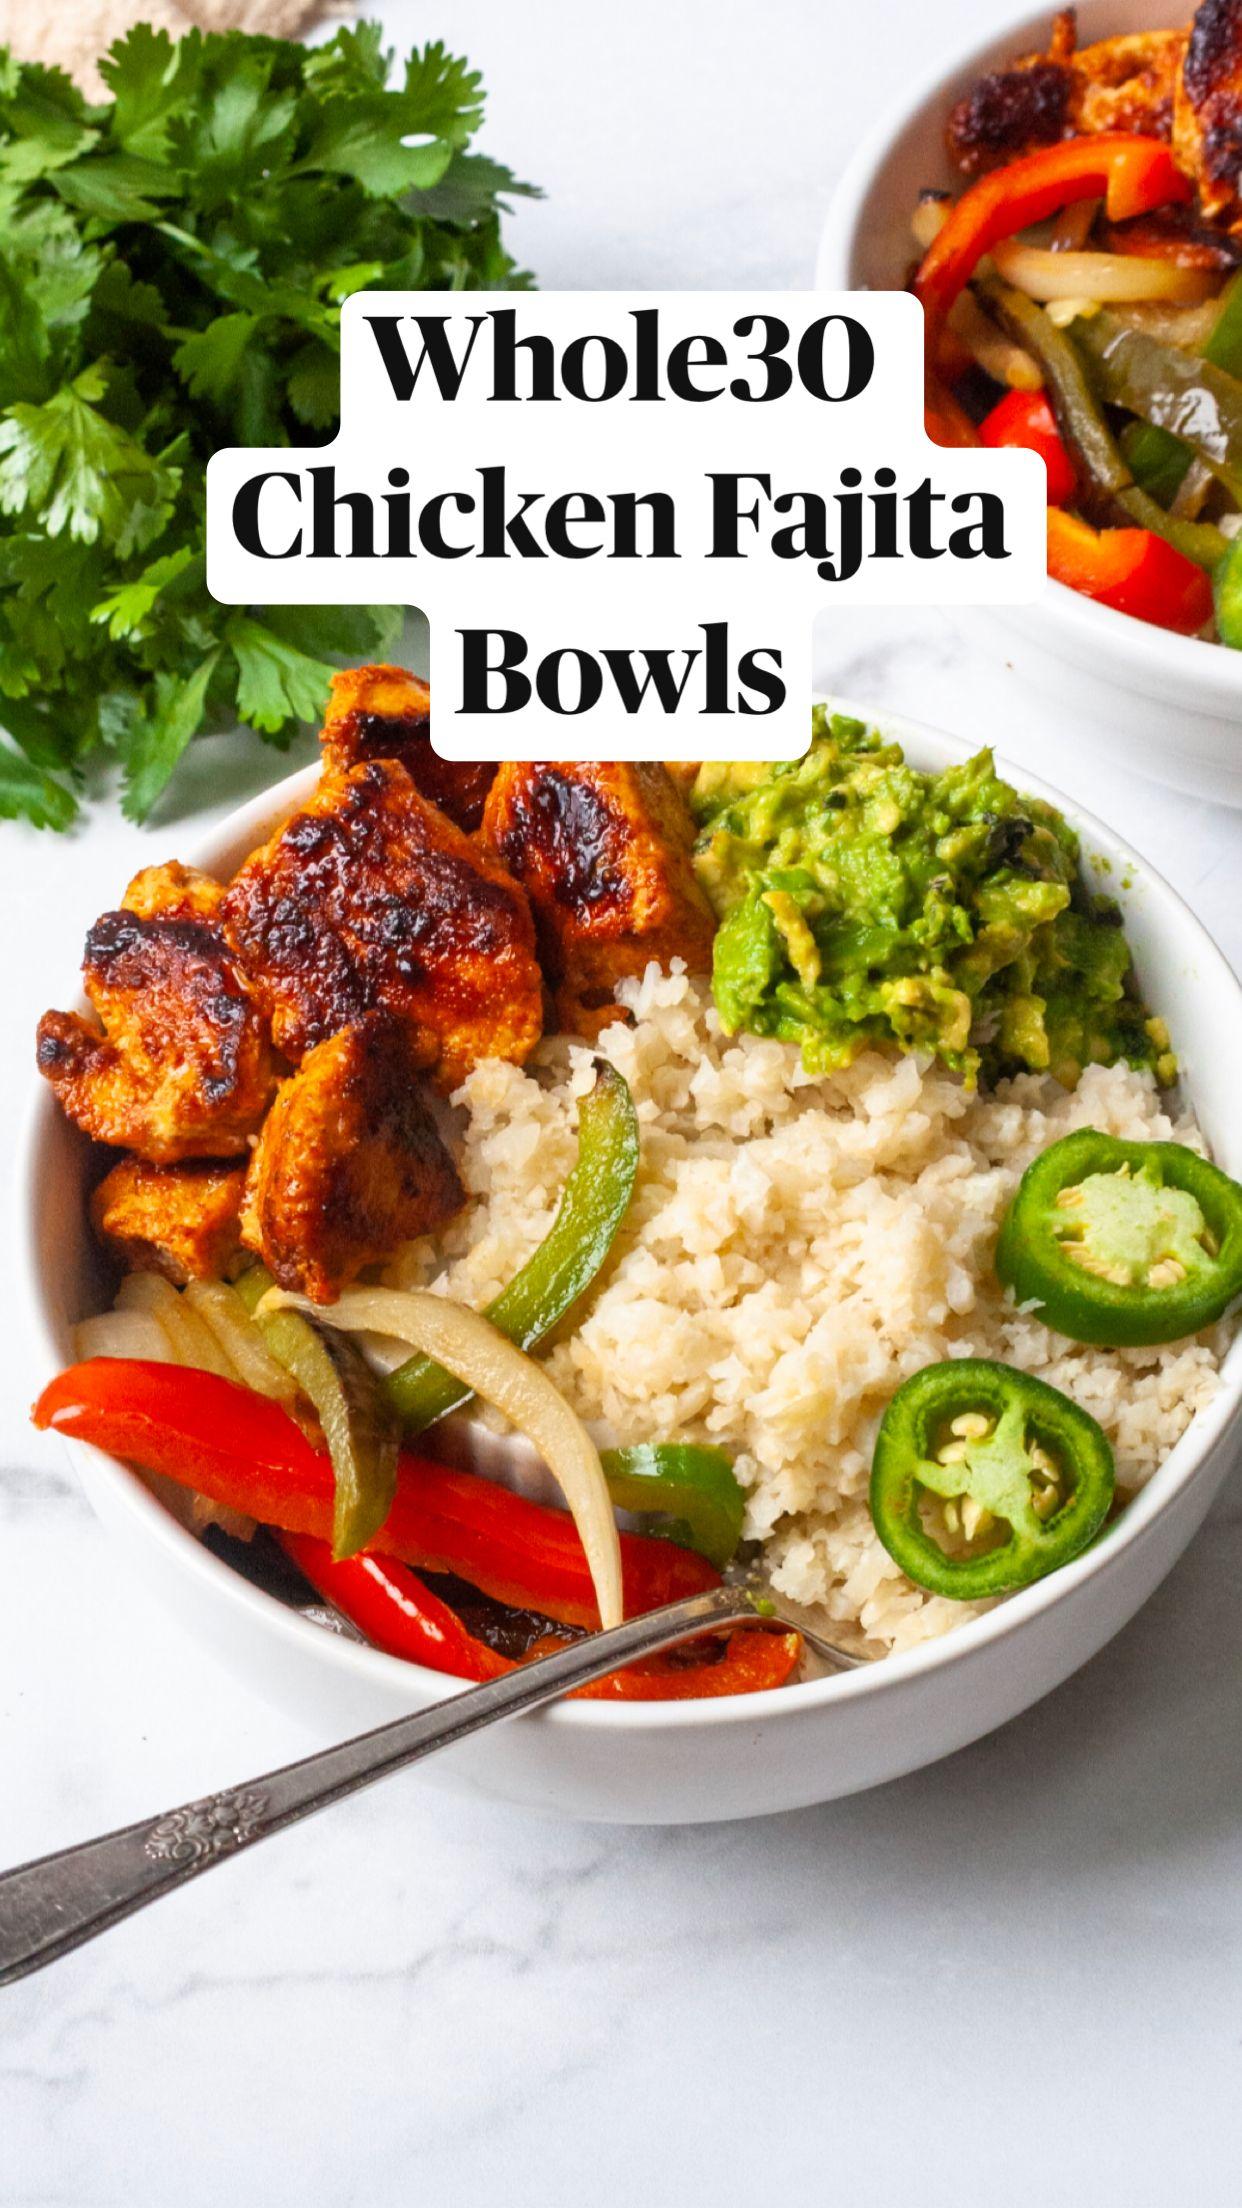 Whole30 Chicken Fajita Bowls